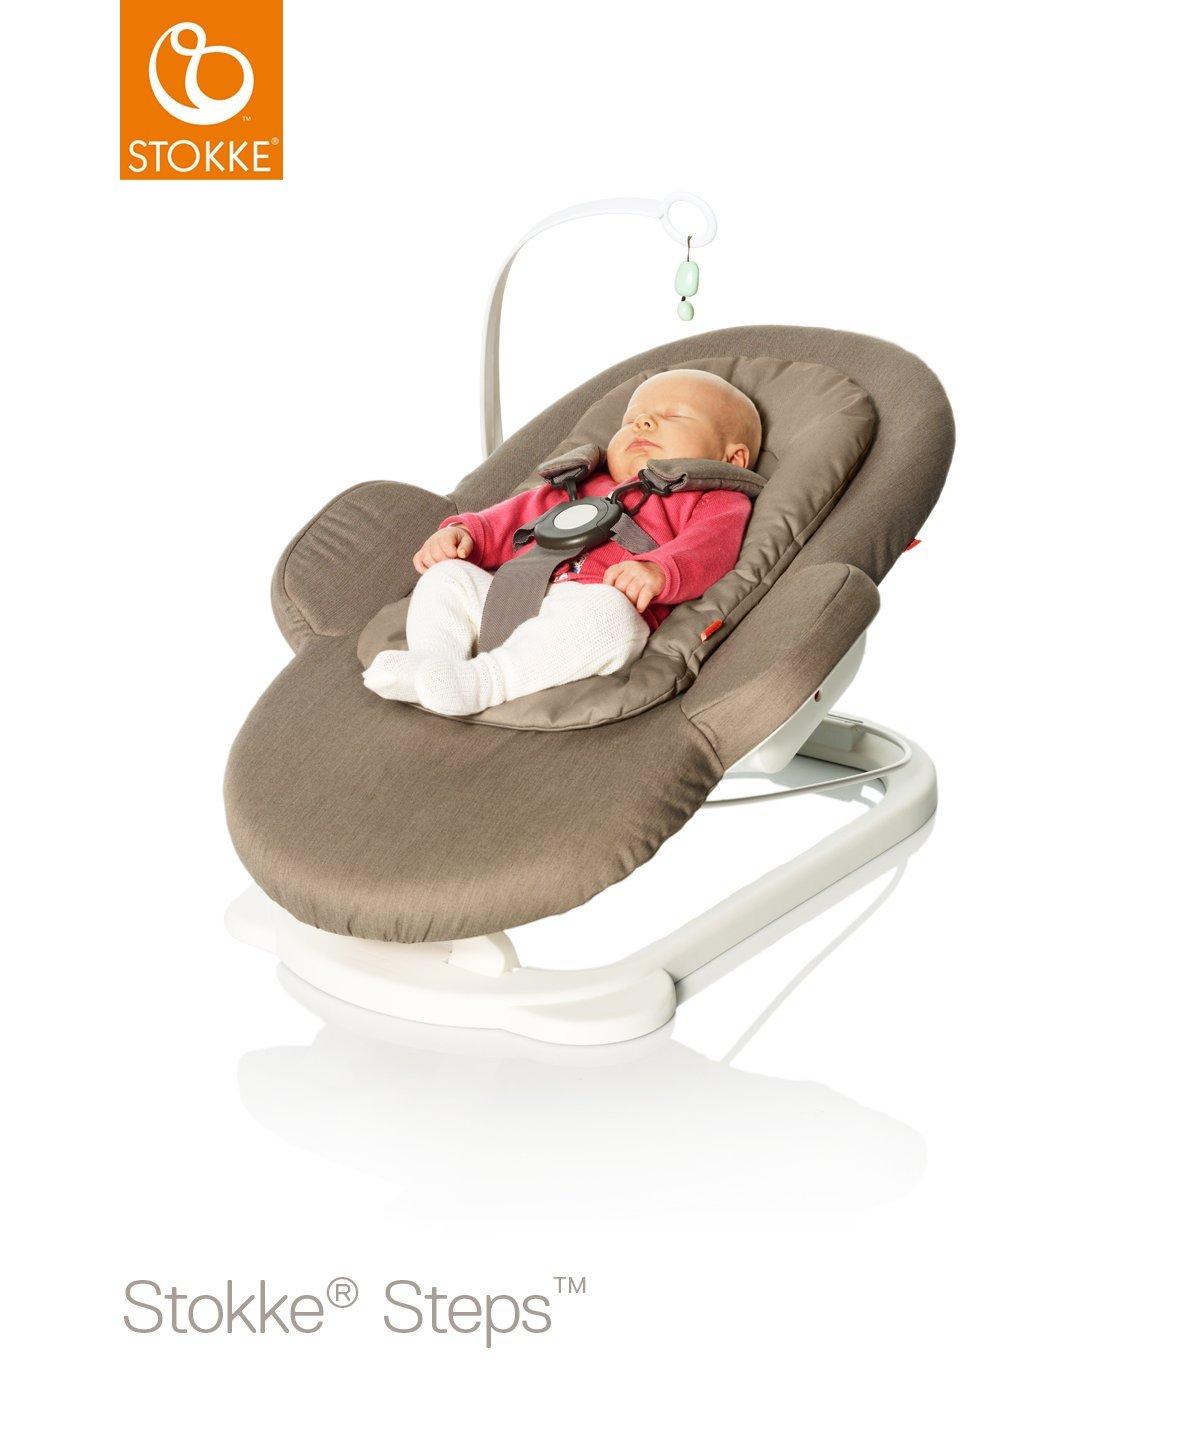 Amazon.com: Stokke Pasos – Silla mecedora, color naranja: Baby